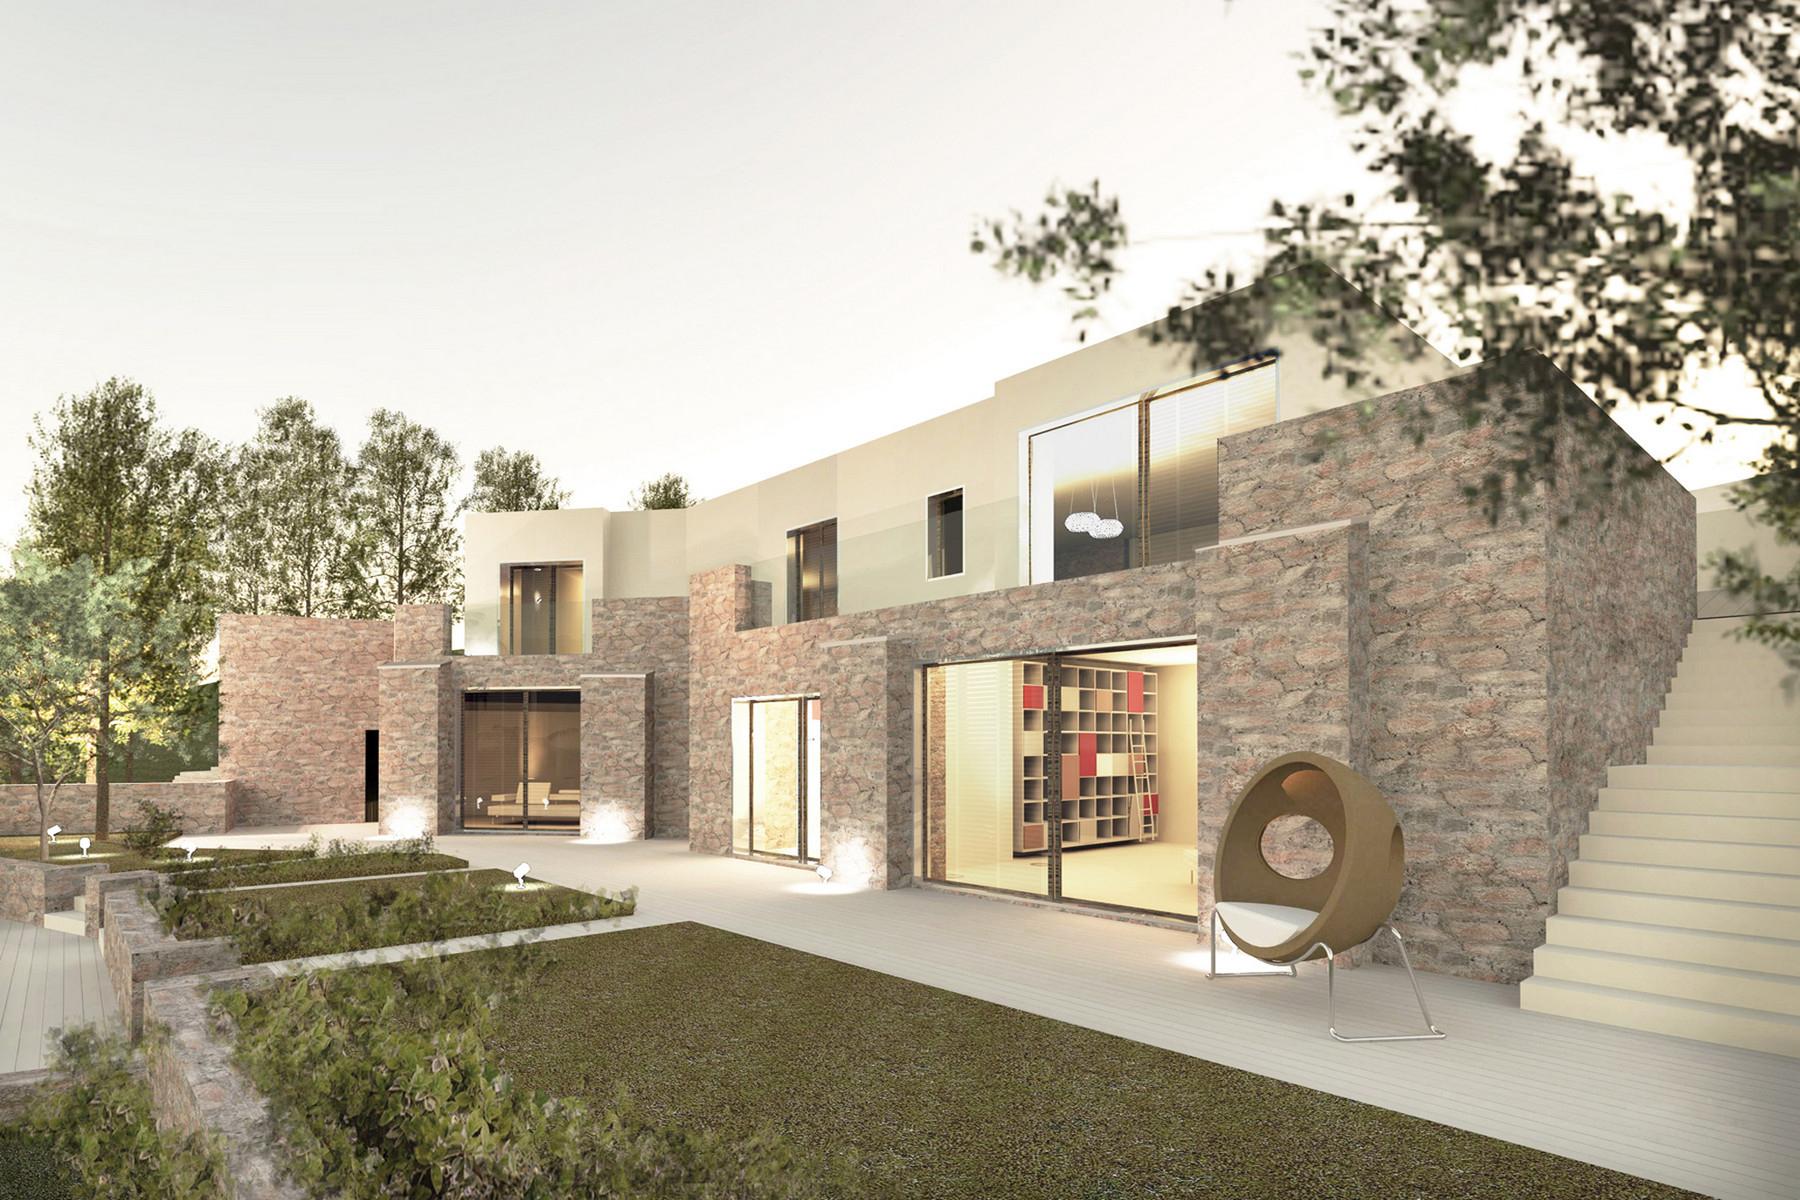 Casa indipendente in Vendita a Varazze: 5 locali, 360 mq